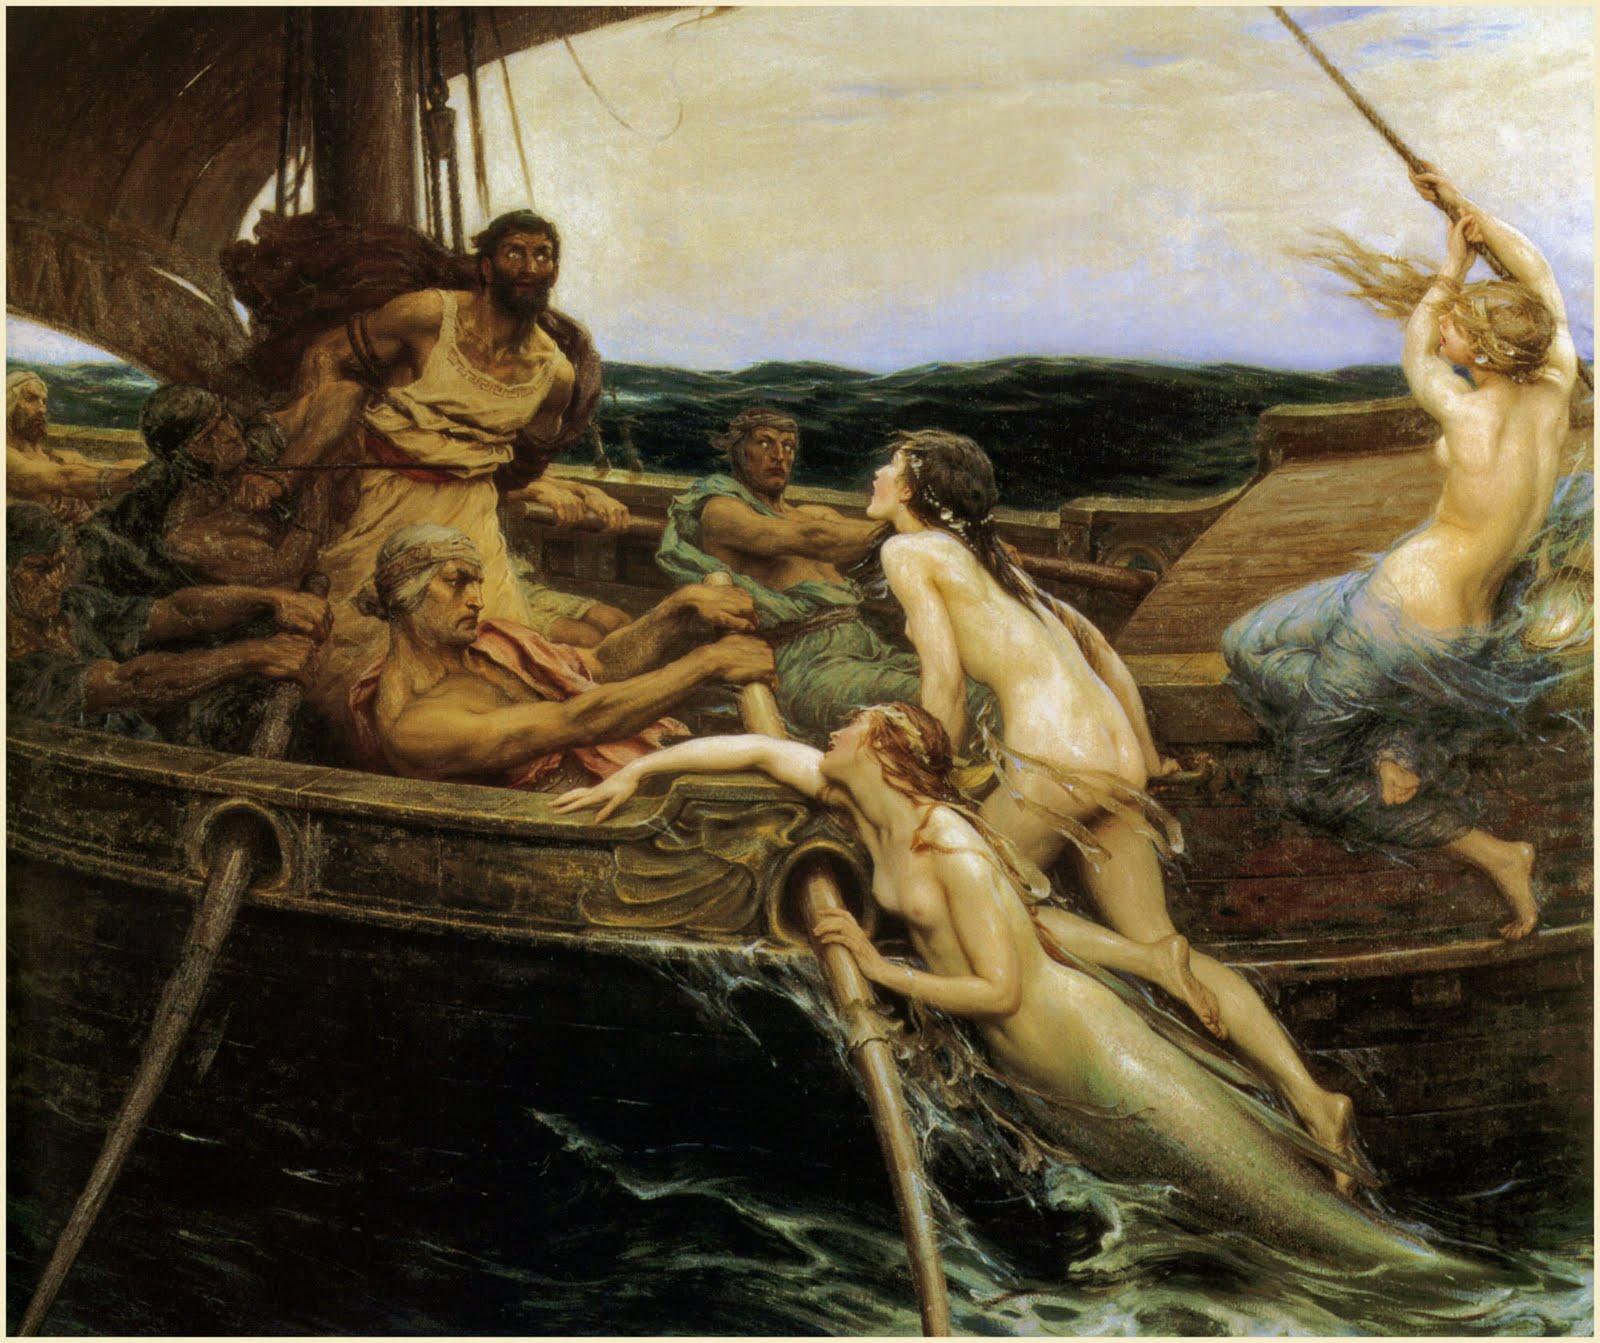 Ulysse et les sirènes, 1909 par Herbert Draper [Public domain], via Wikimedia Commons